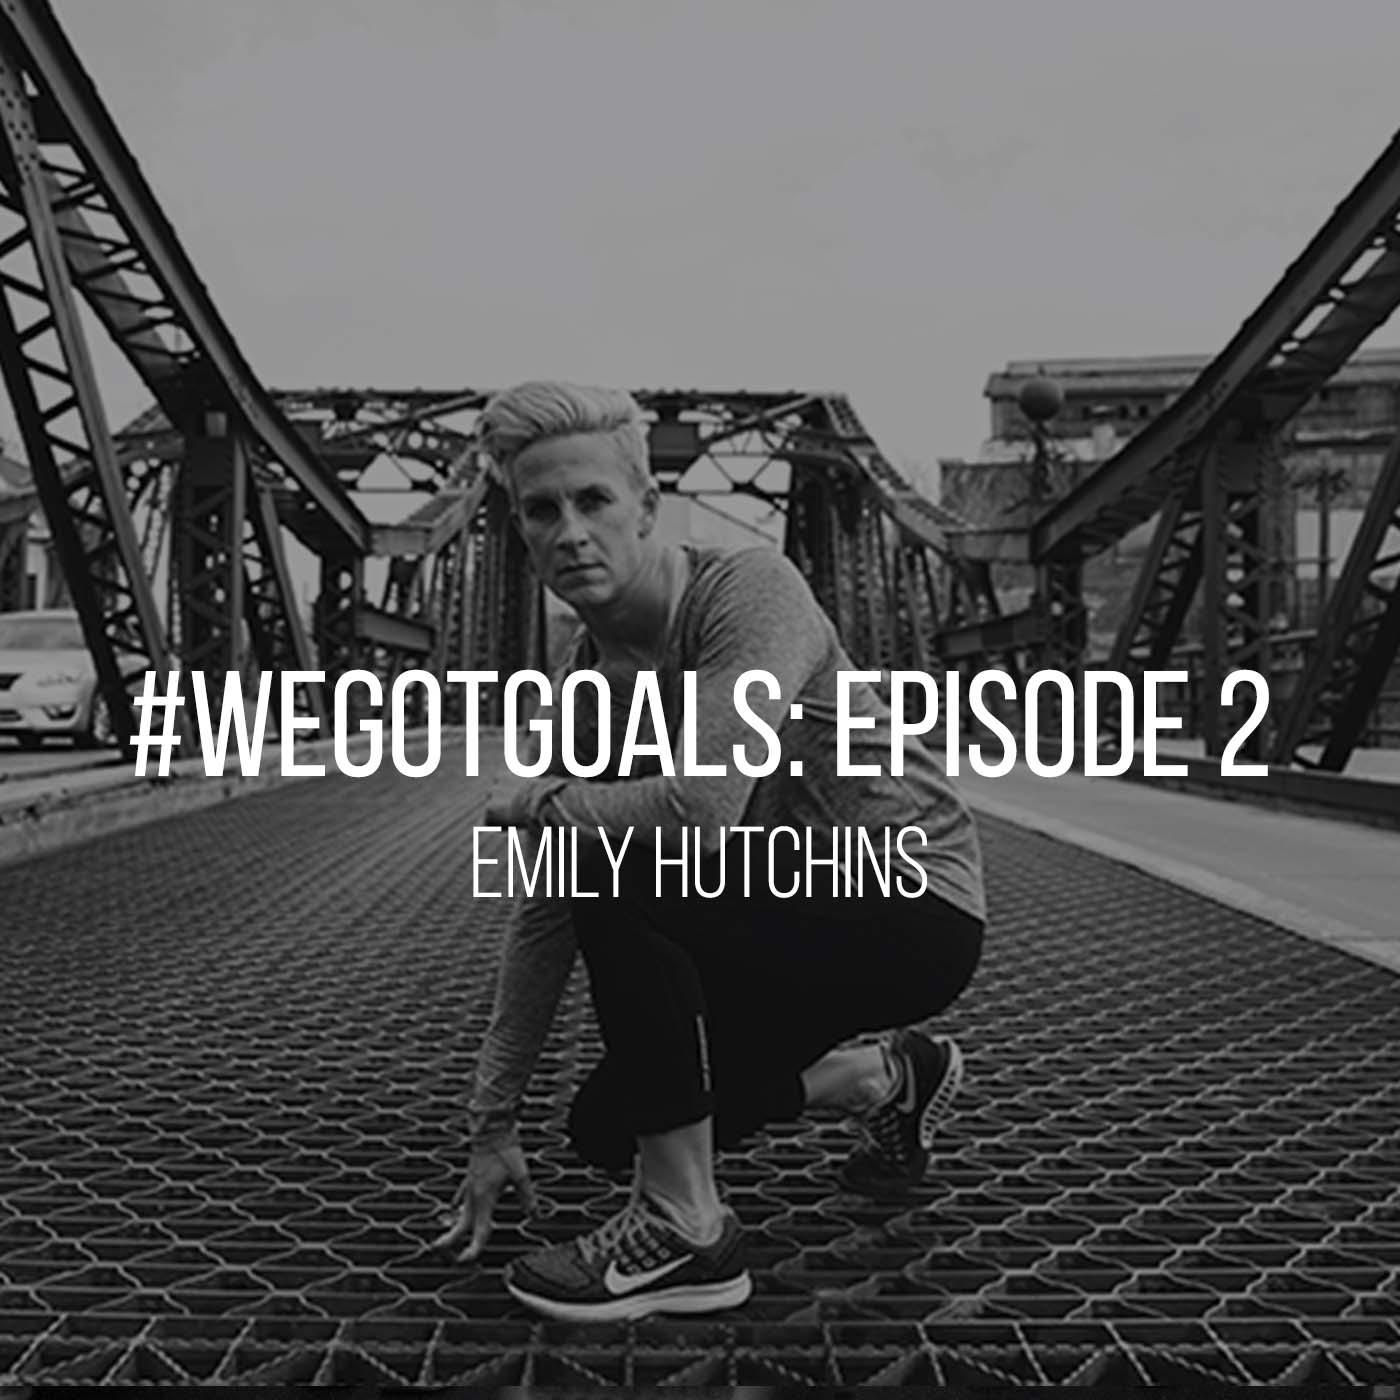 WeGotGoals_Episode 2_Emily Hutchins